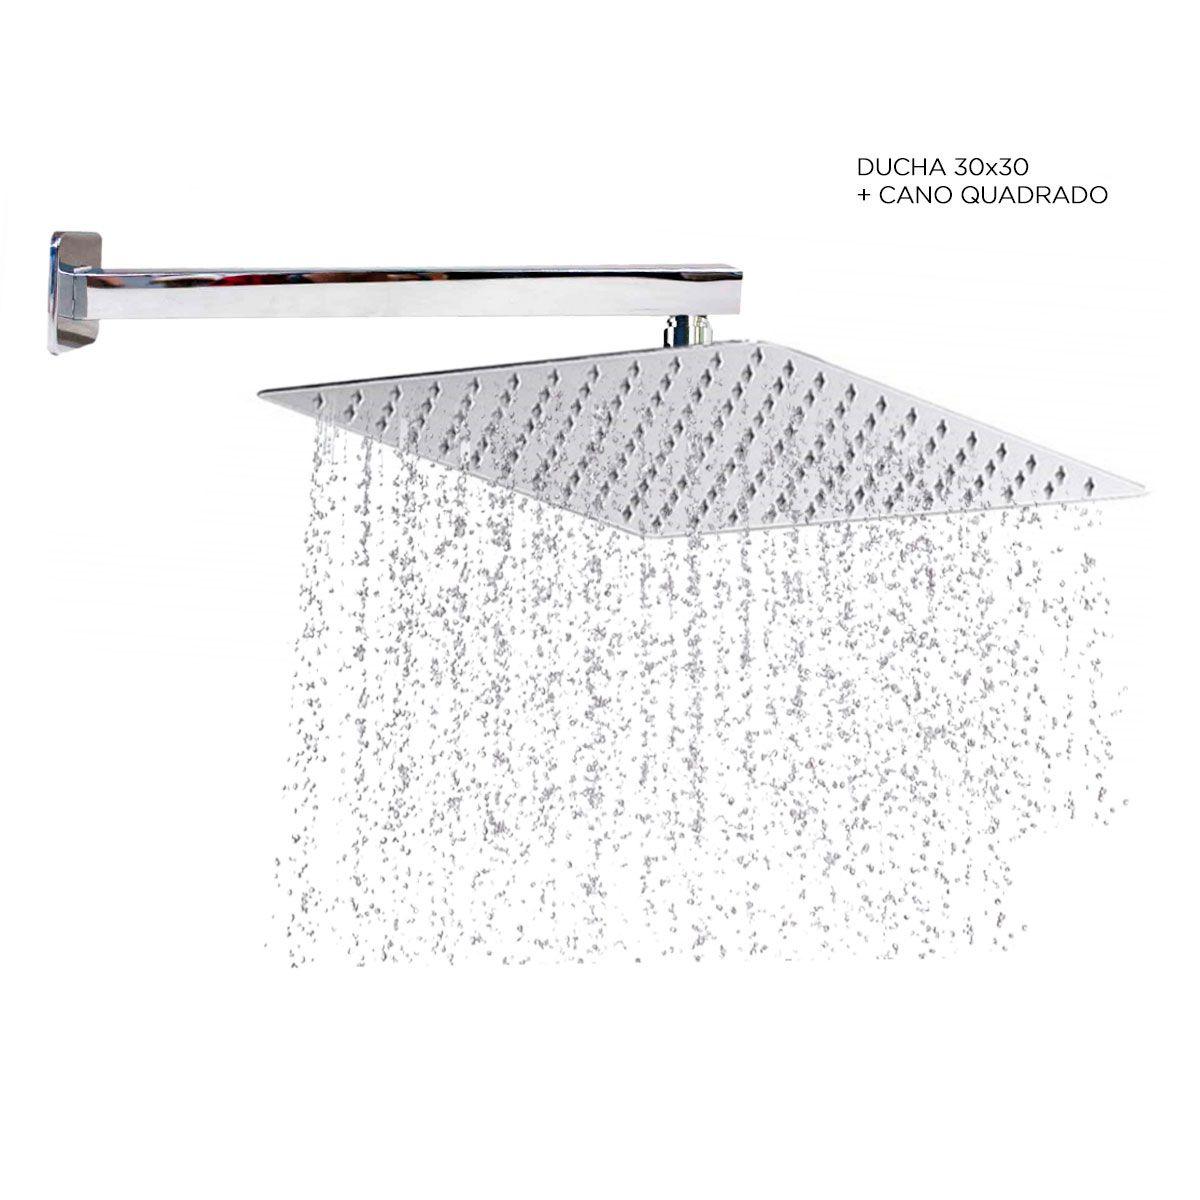 Kit Ducha Inox Chuveiro 30x30 Cm + Cano 35 Cm Quadrada